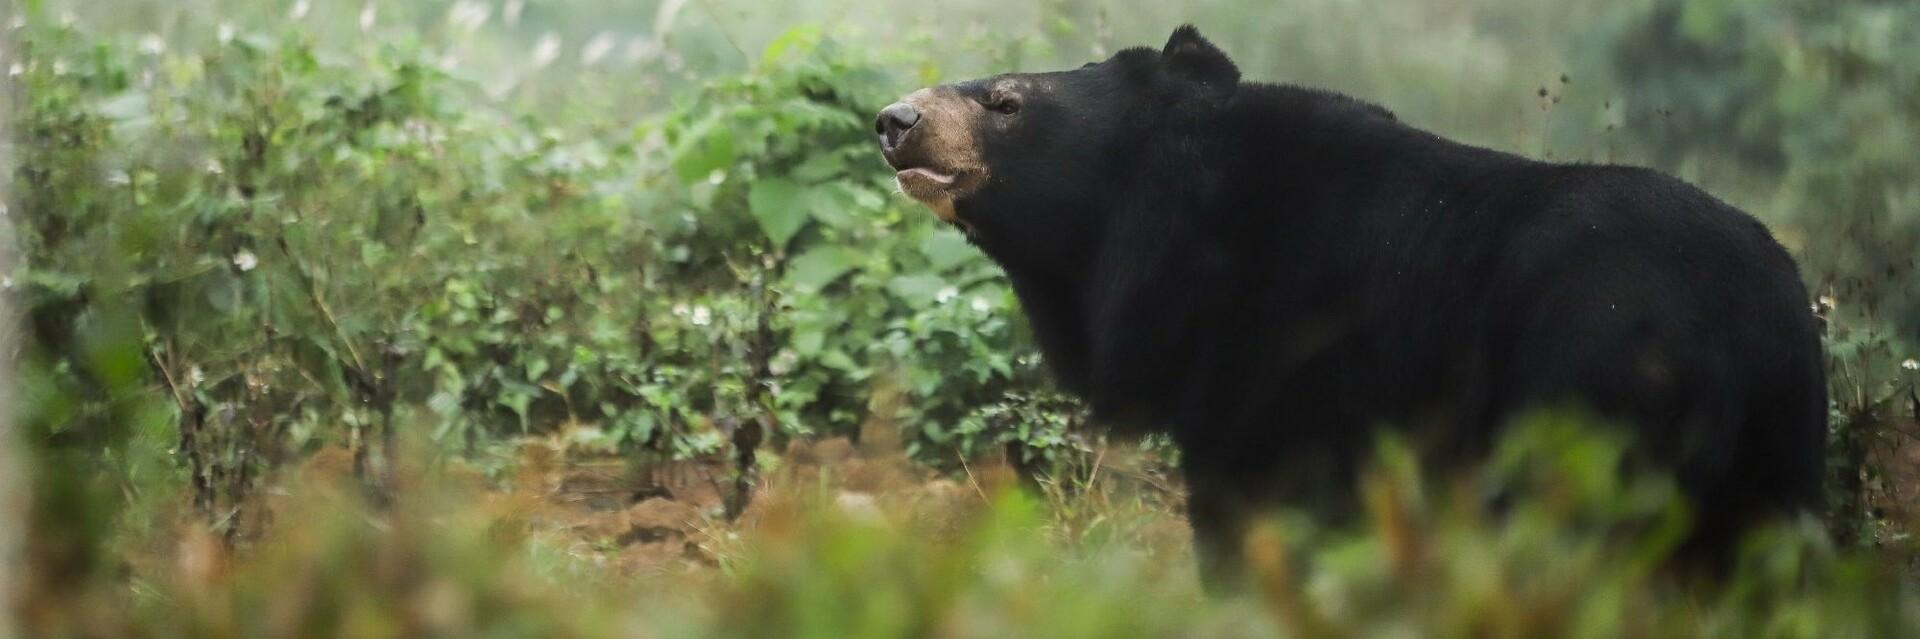 Asiatic black bear in BEAR SANCTUARY Ninh Binh